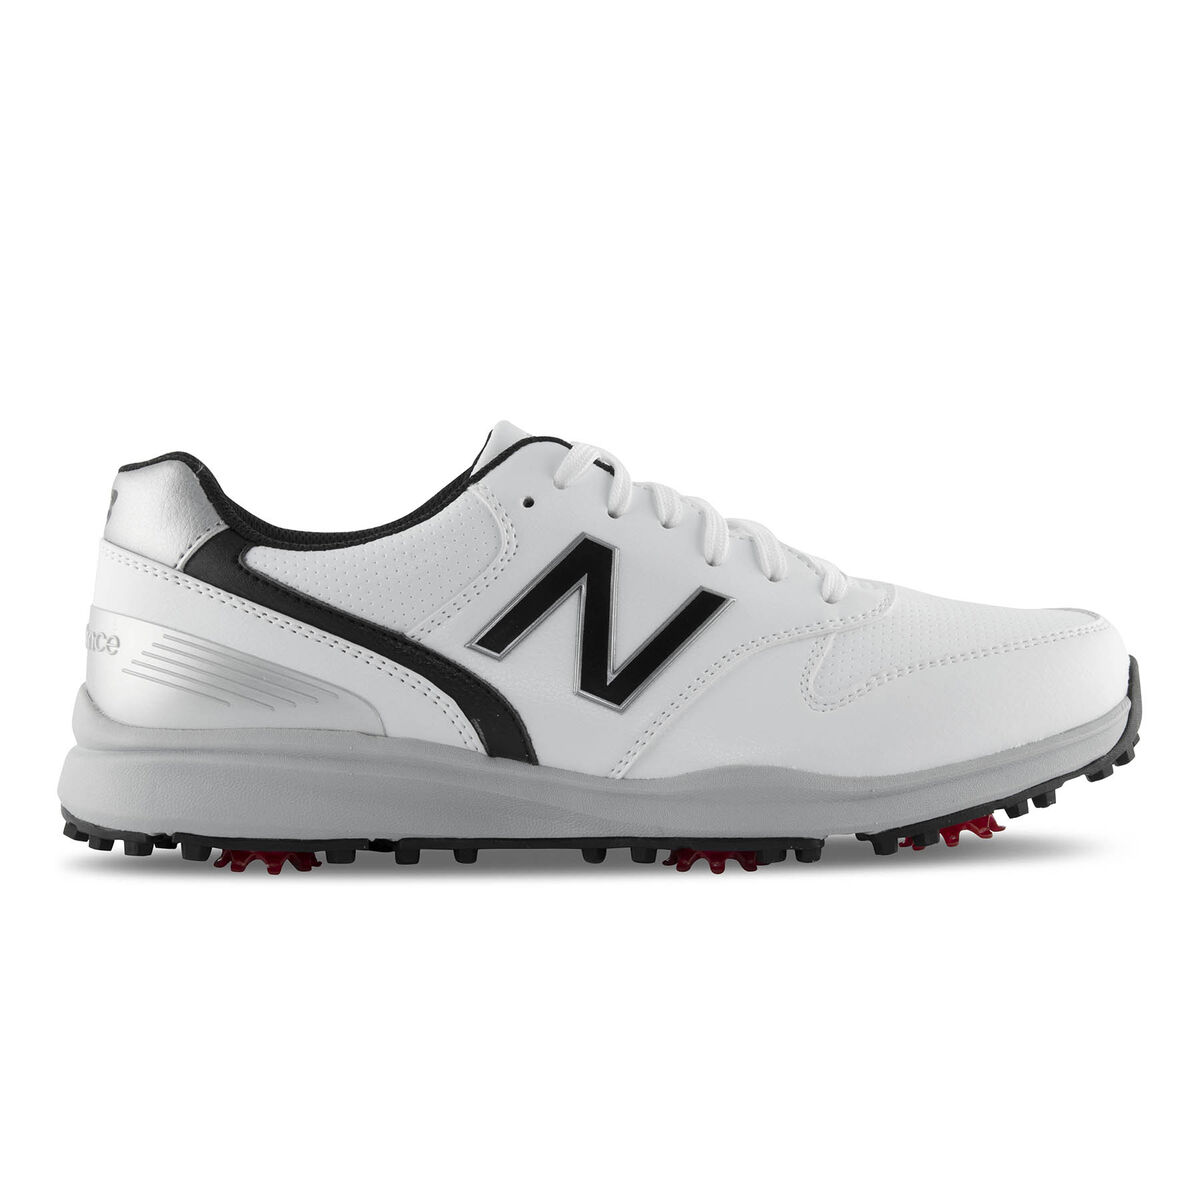 dacb8623622ae New Balance Sweeper Men's Golf Shoe - White/Black | PGA TOUR Superstore